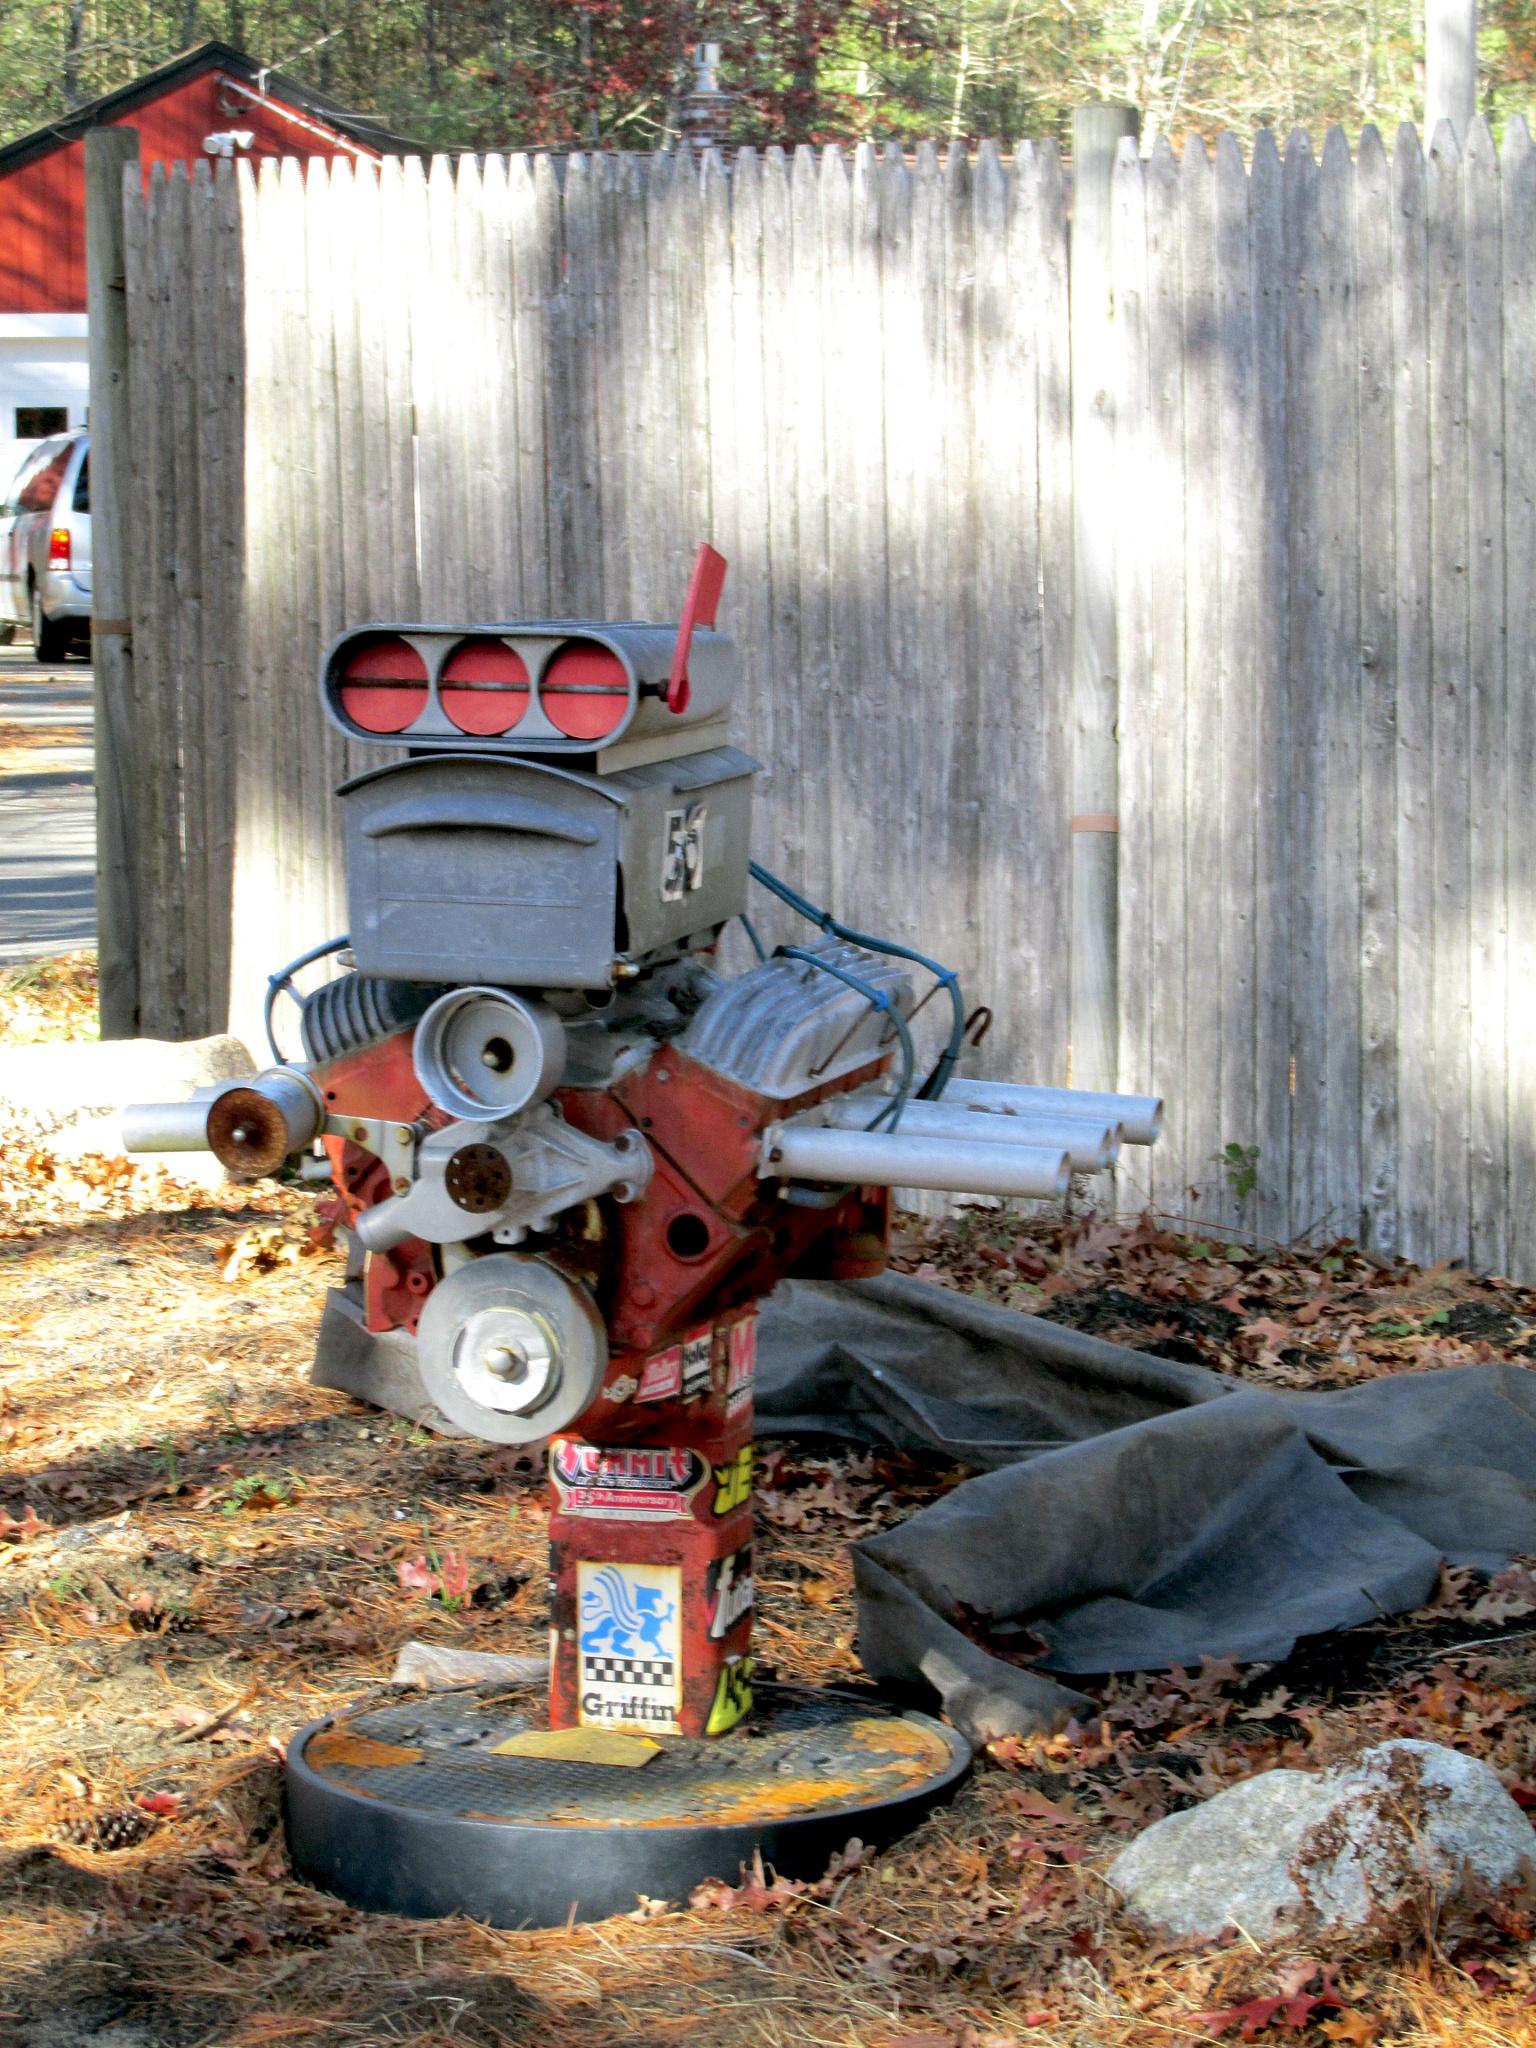 Supercharged mailbox 1 by John Lyon